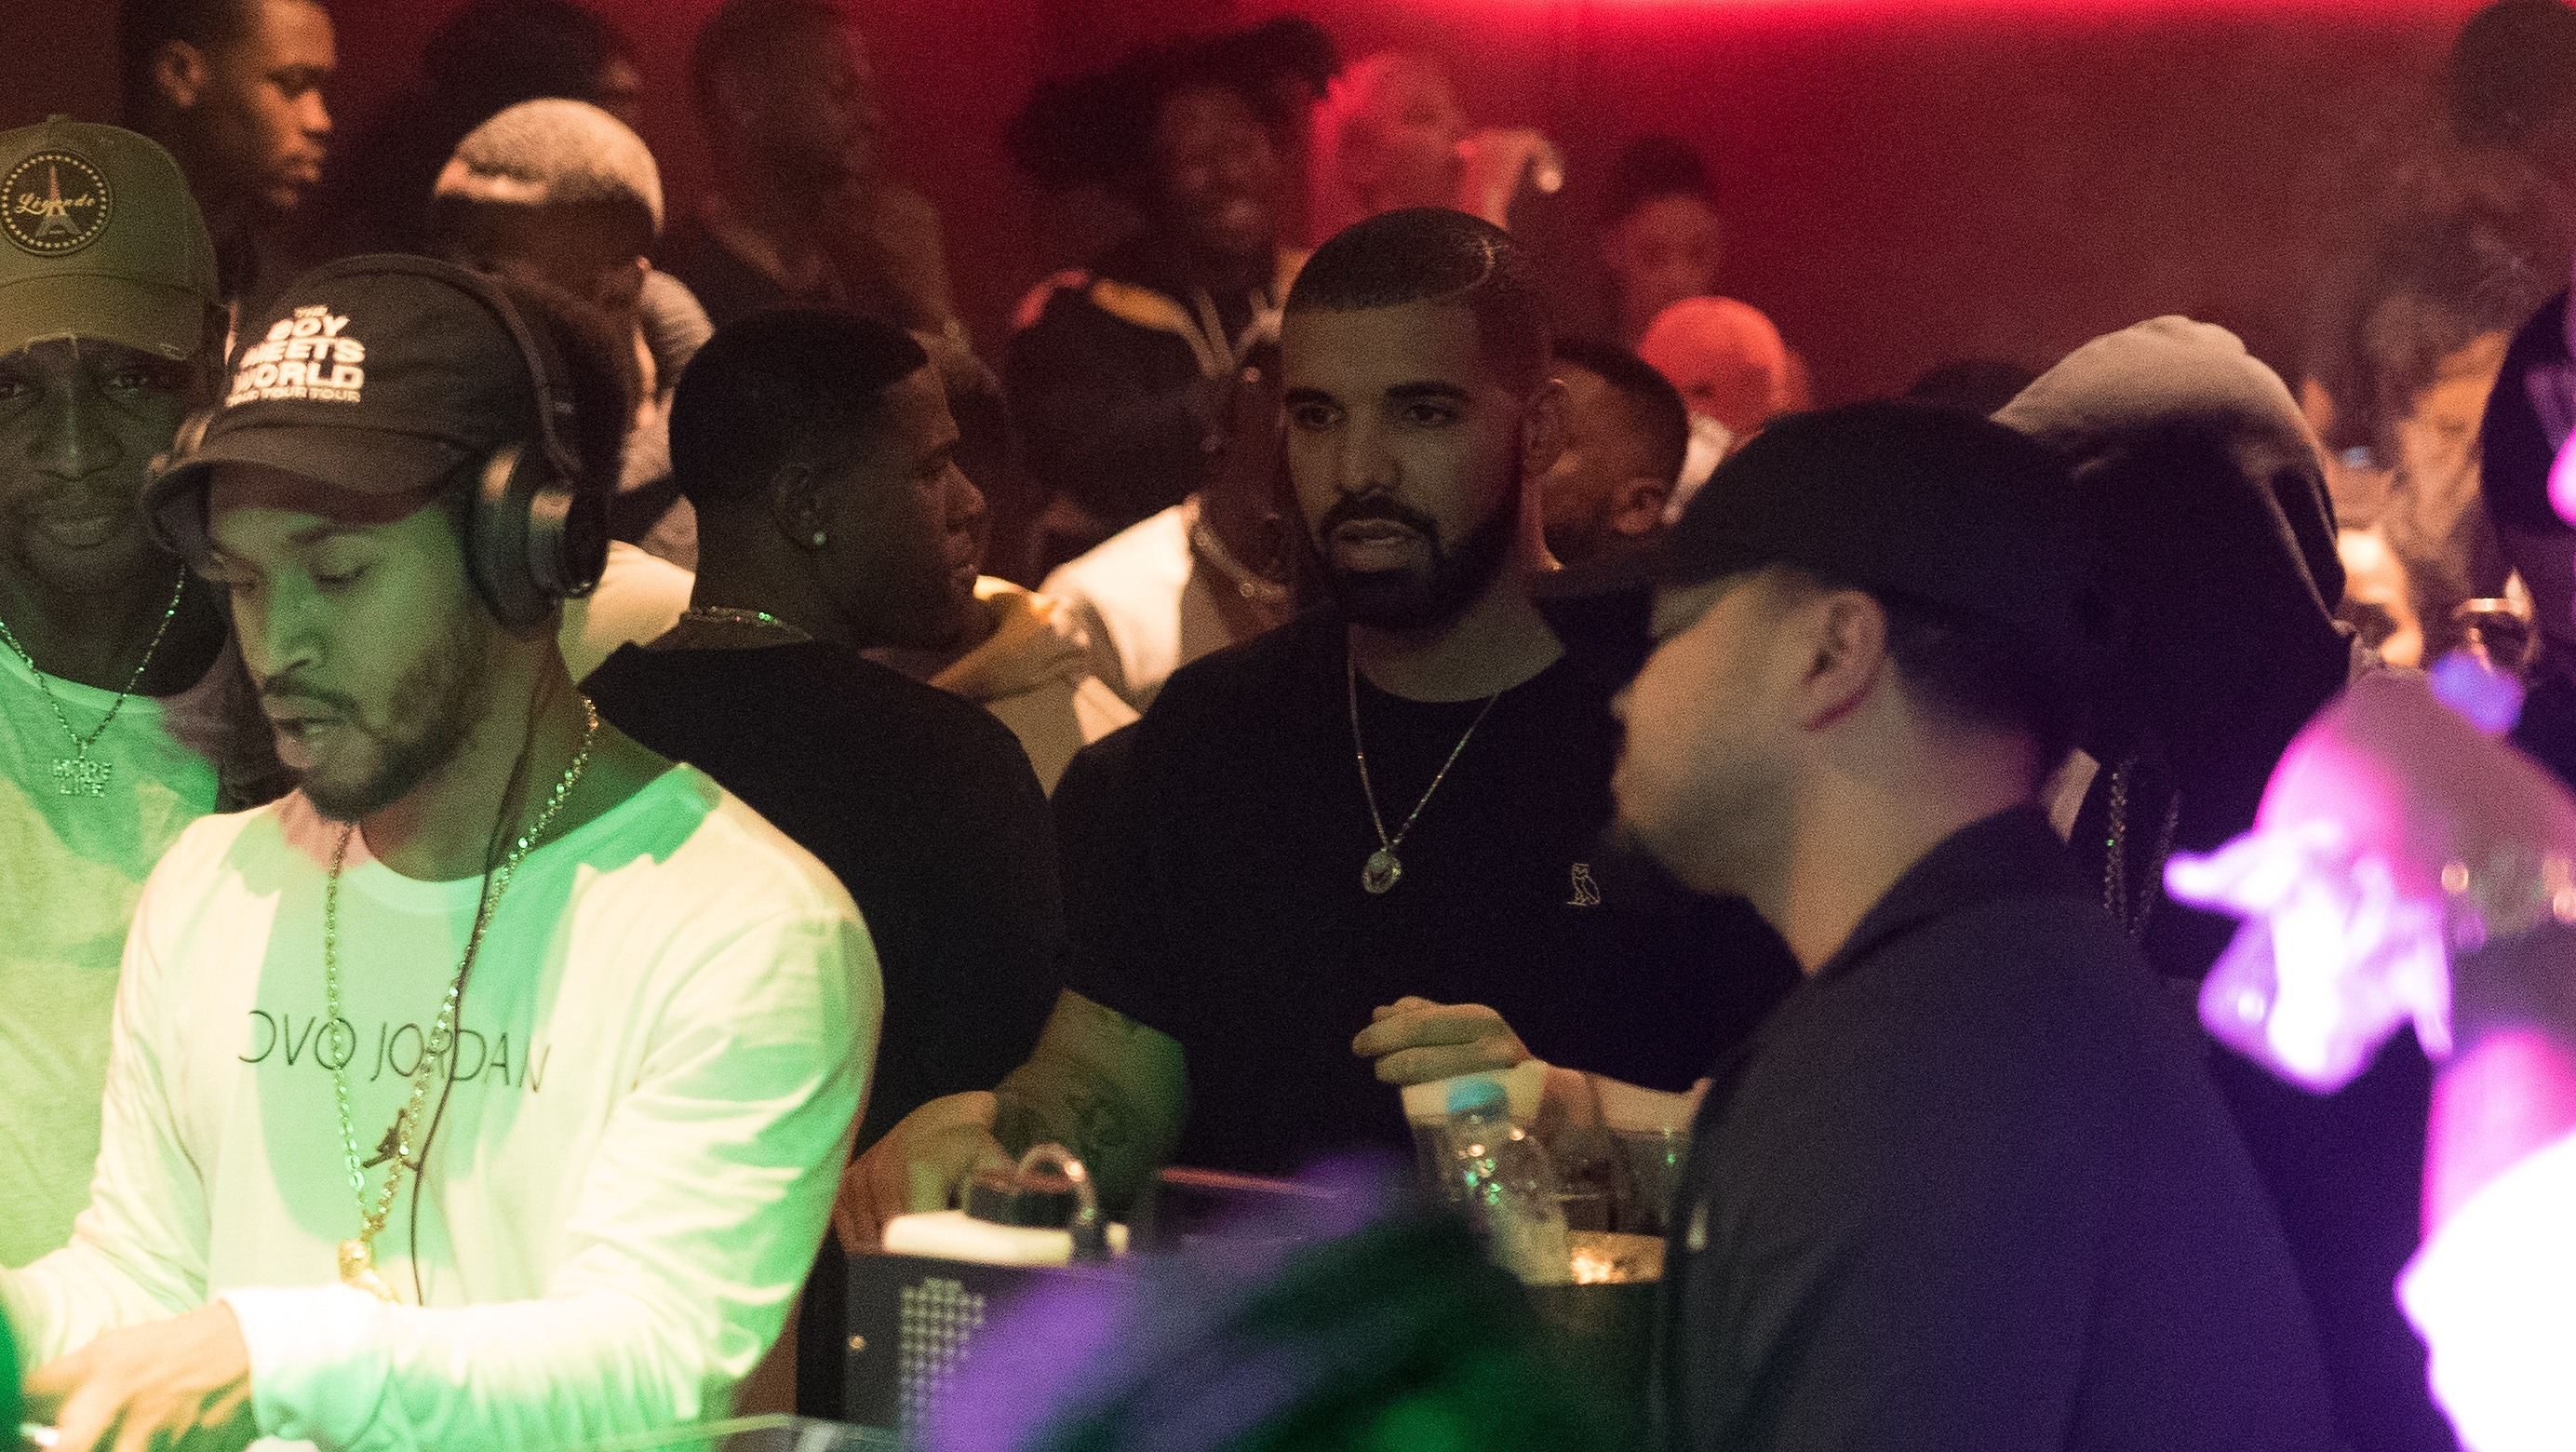 Drake in London nightclub